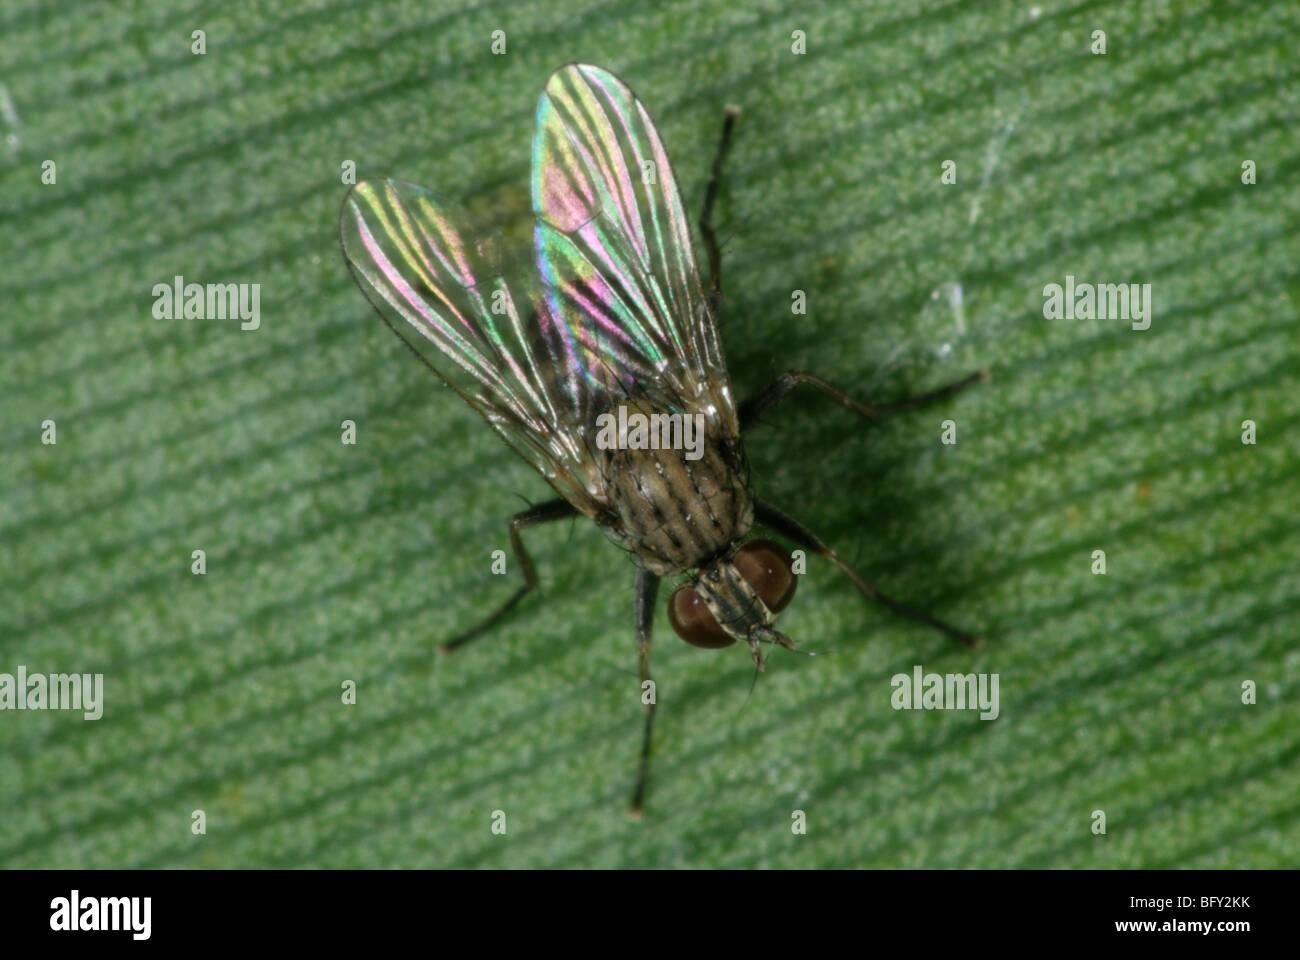 A hunter fly (Coenosia attenuata) a predatory fly on a leaf - Stock Image